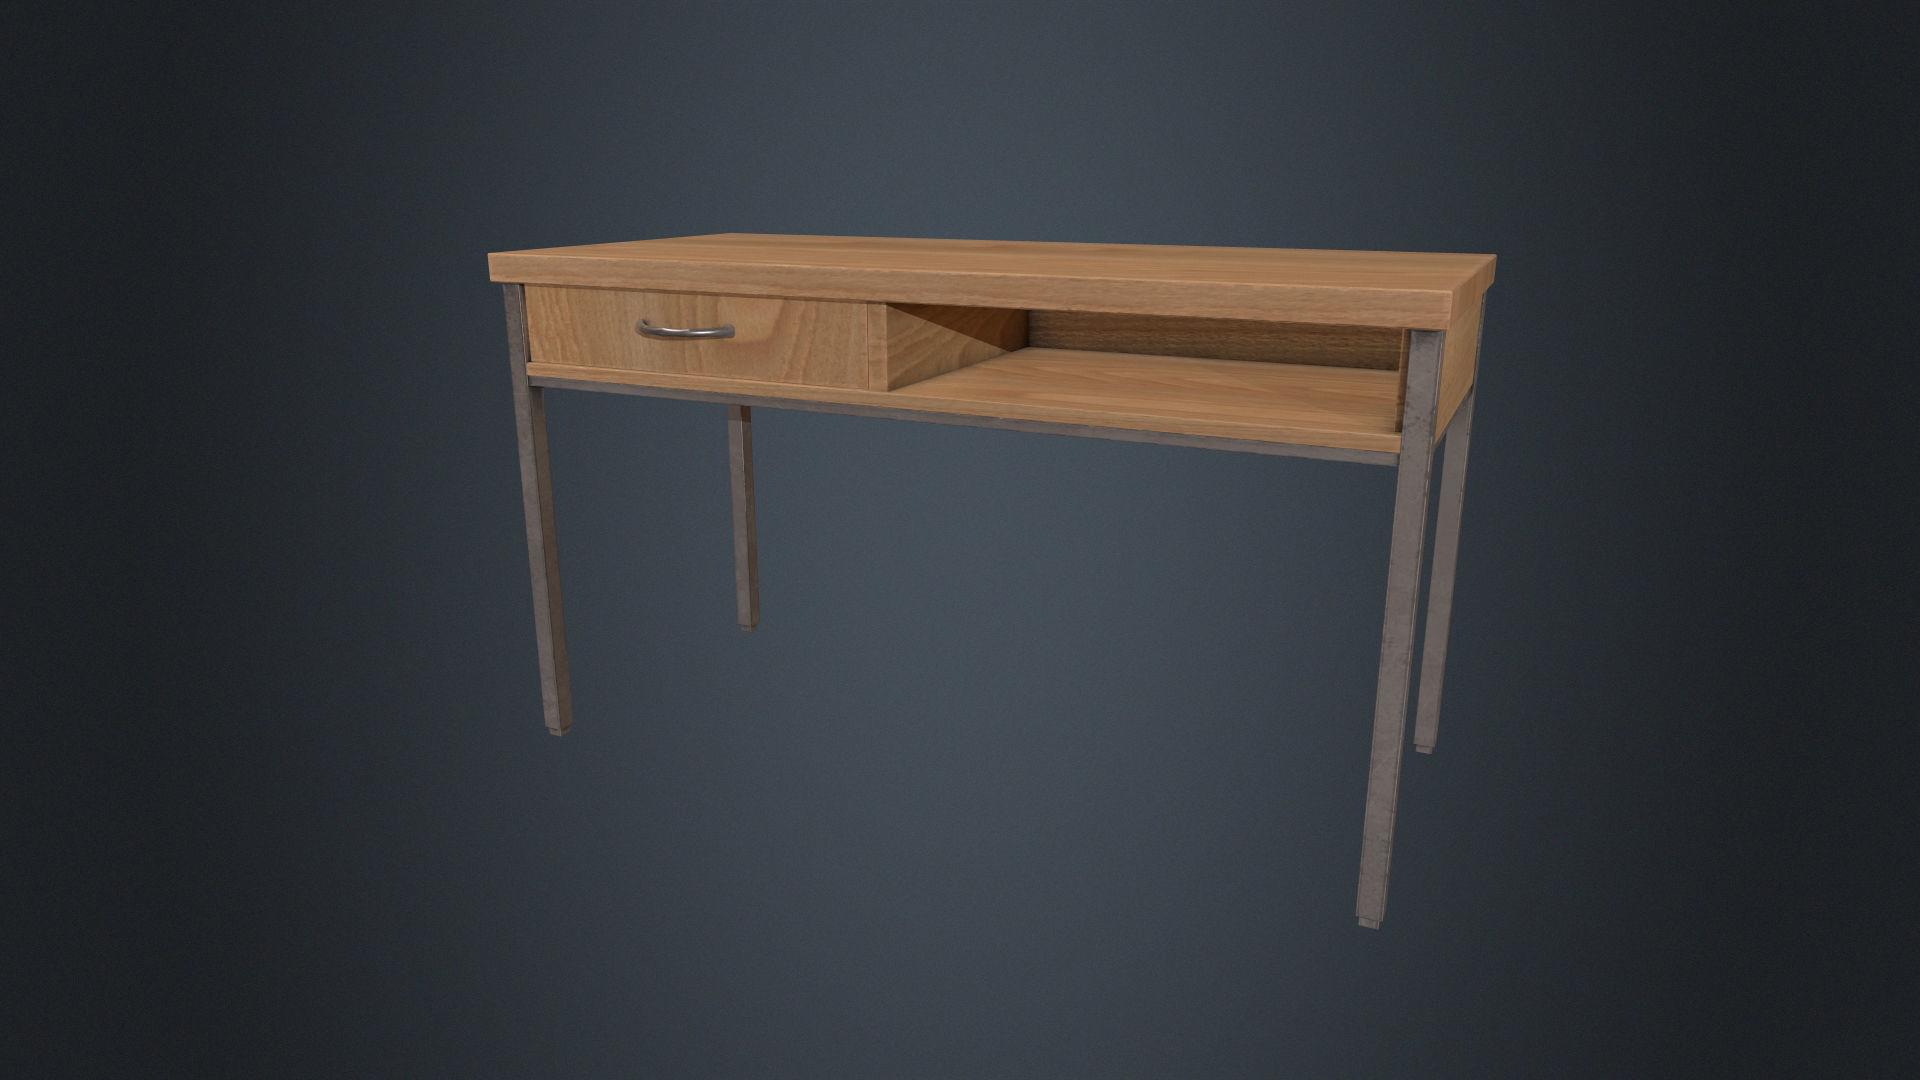 Beech Wood Desk - Office Desk - Desk - Beech Desk - Furniture